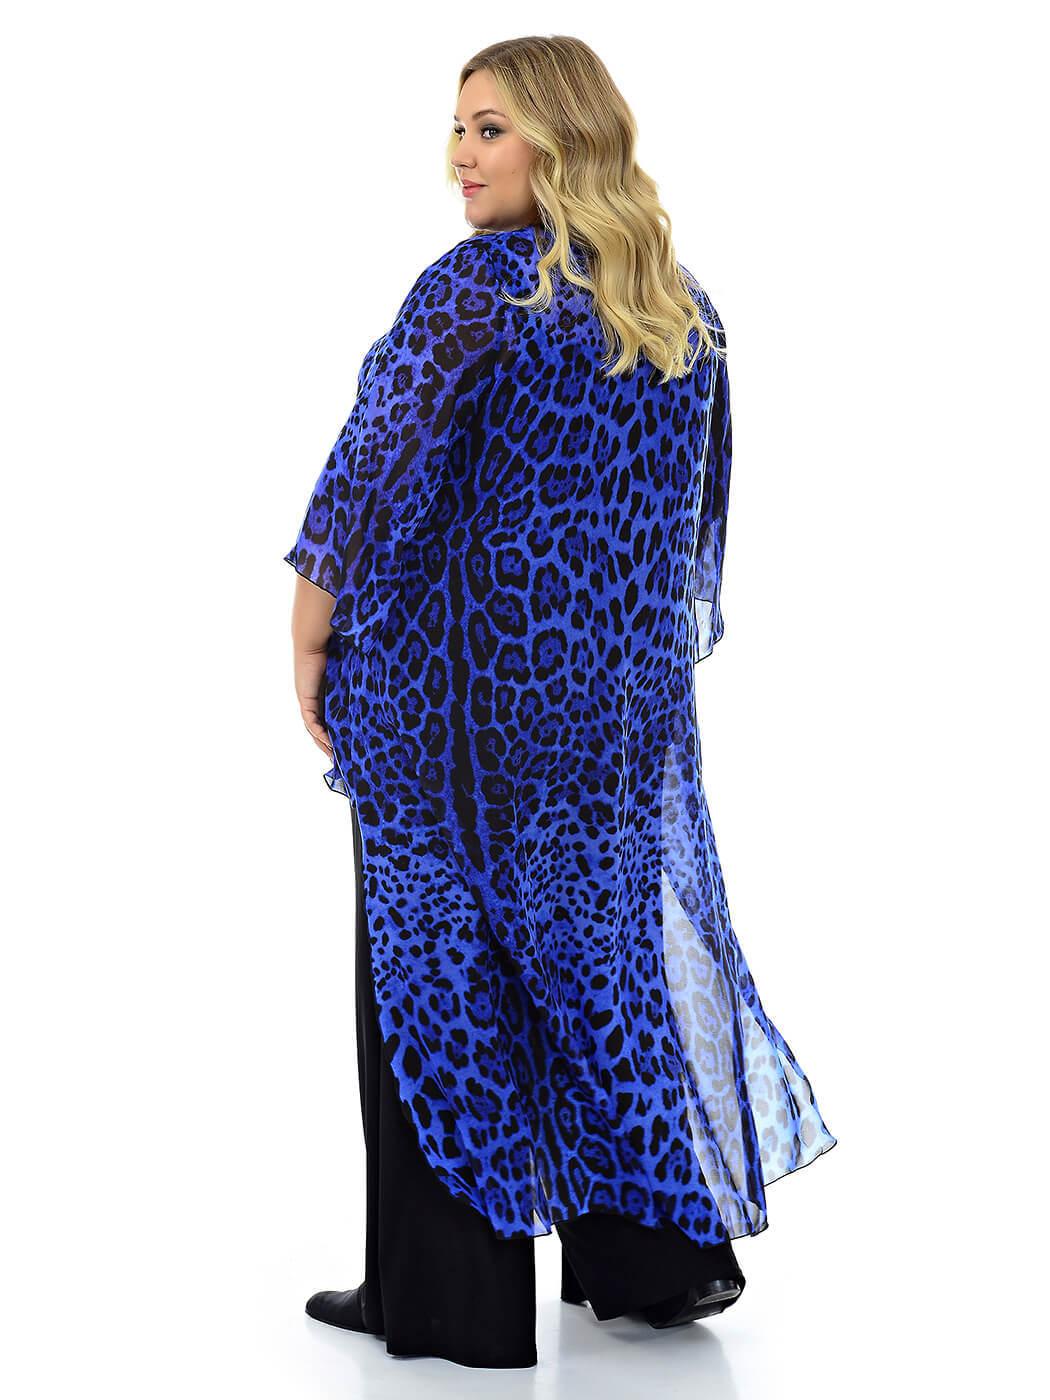 Туника разноуровневая из шифона, Синий леопард